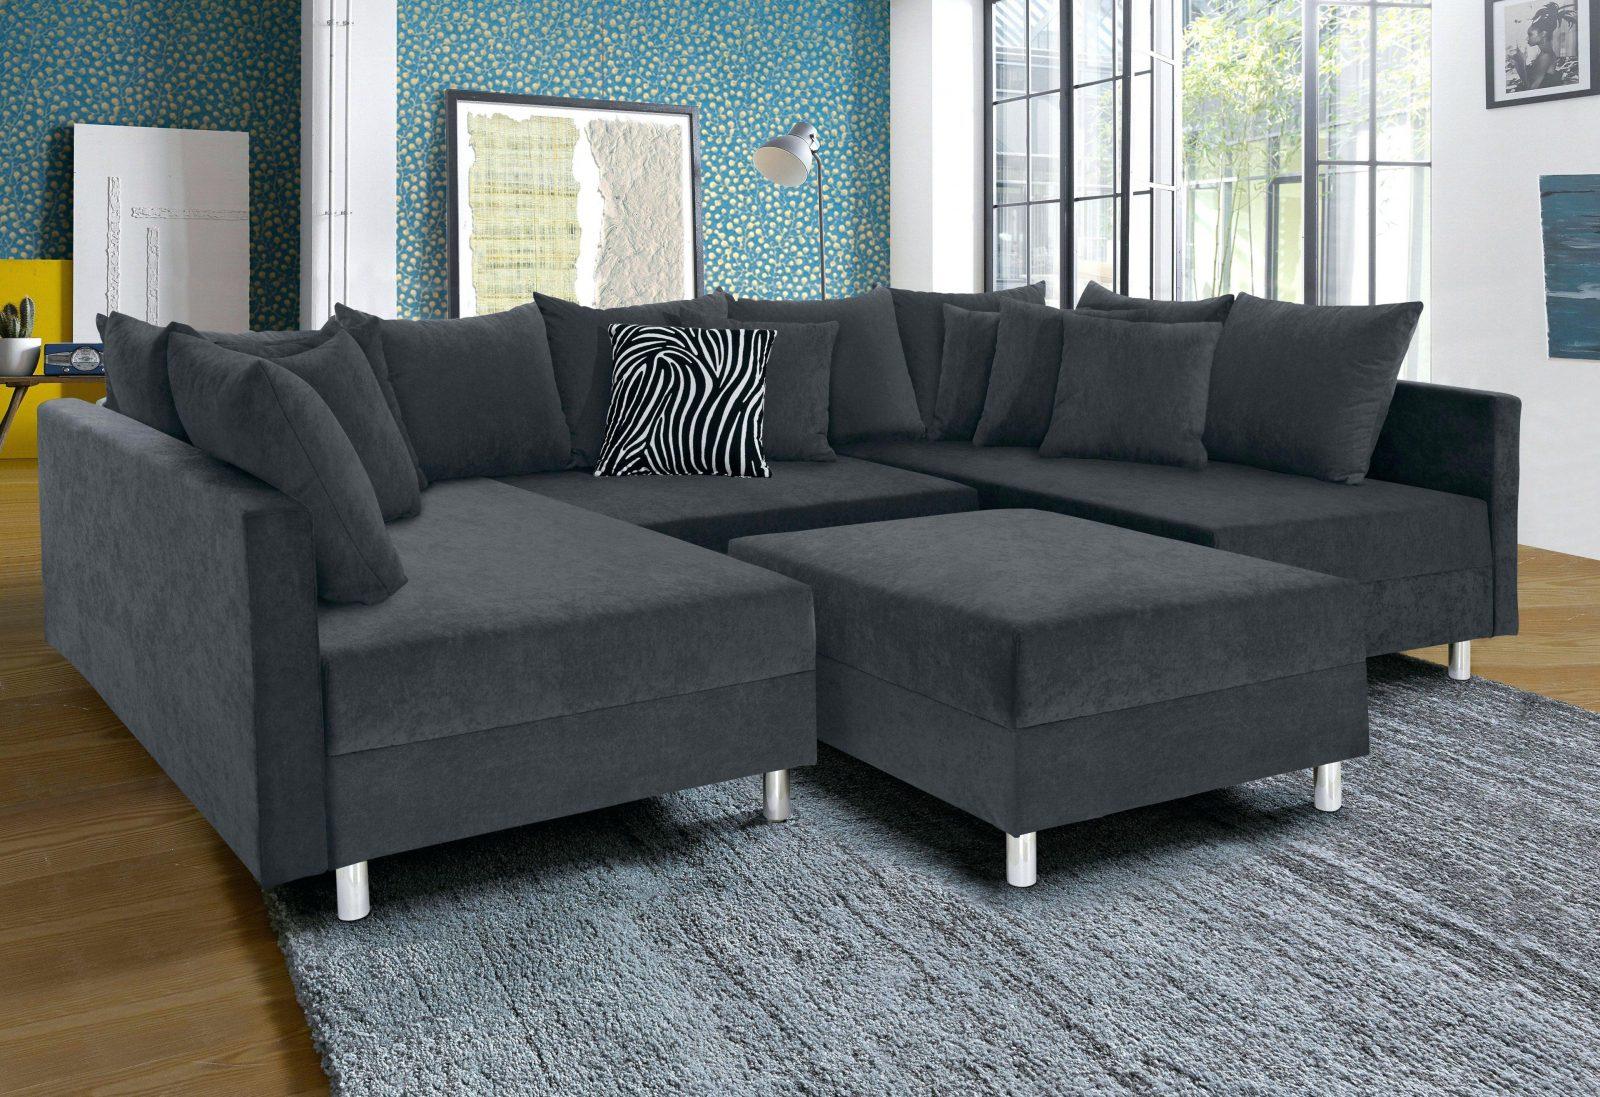 sofa auf raten kaufen trotz schufa with sofa auf raten kaufen trotz von sofa auf raten kaufen. Black Bedroom Furniture Sets. Home Design Ideas